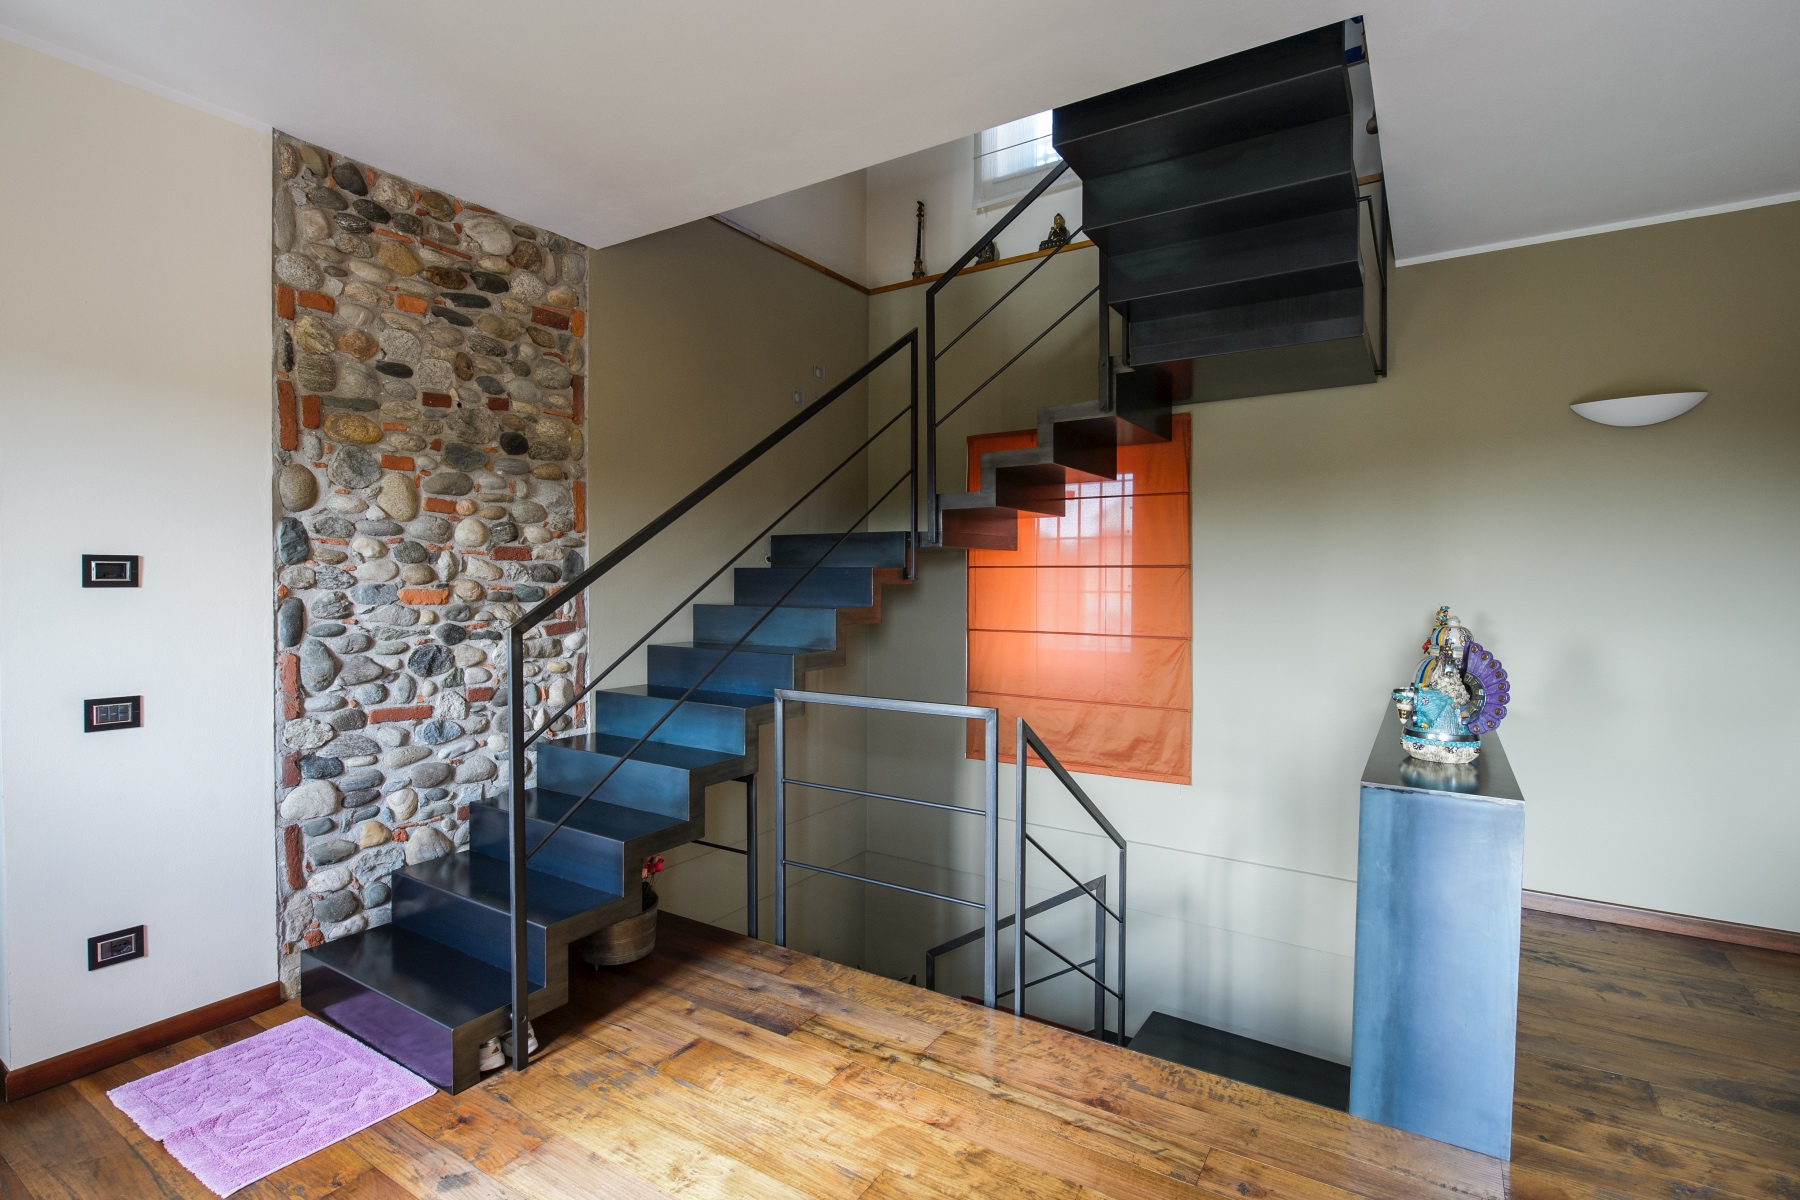 Casa indipendente in Vendita a Agrate Conturbia: 5 locali, 400 mq - Foto 11